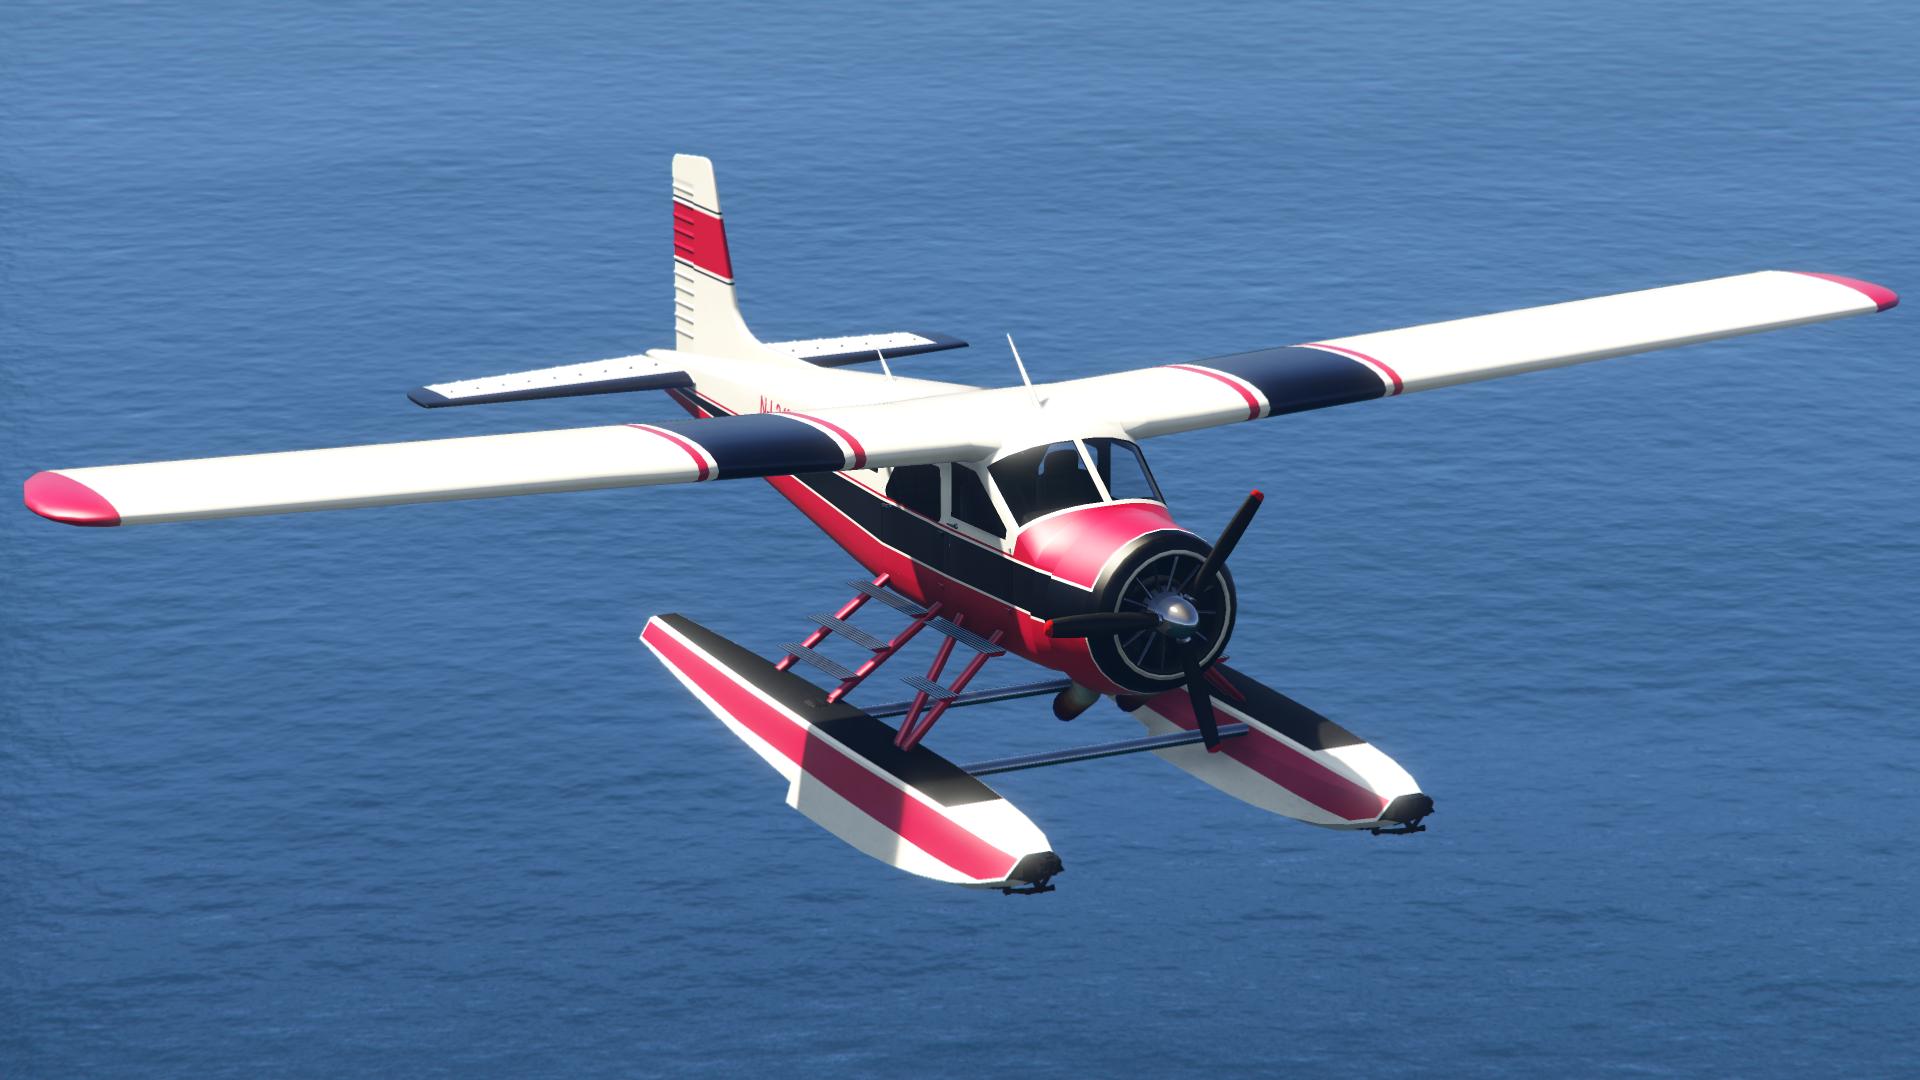 Category:Propeller Aircraft | GTA Wiki | FANDOM powered by Wikia